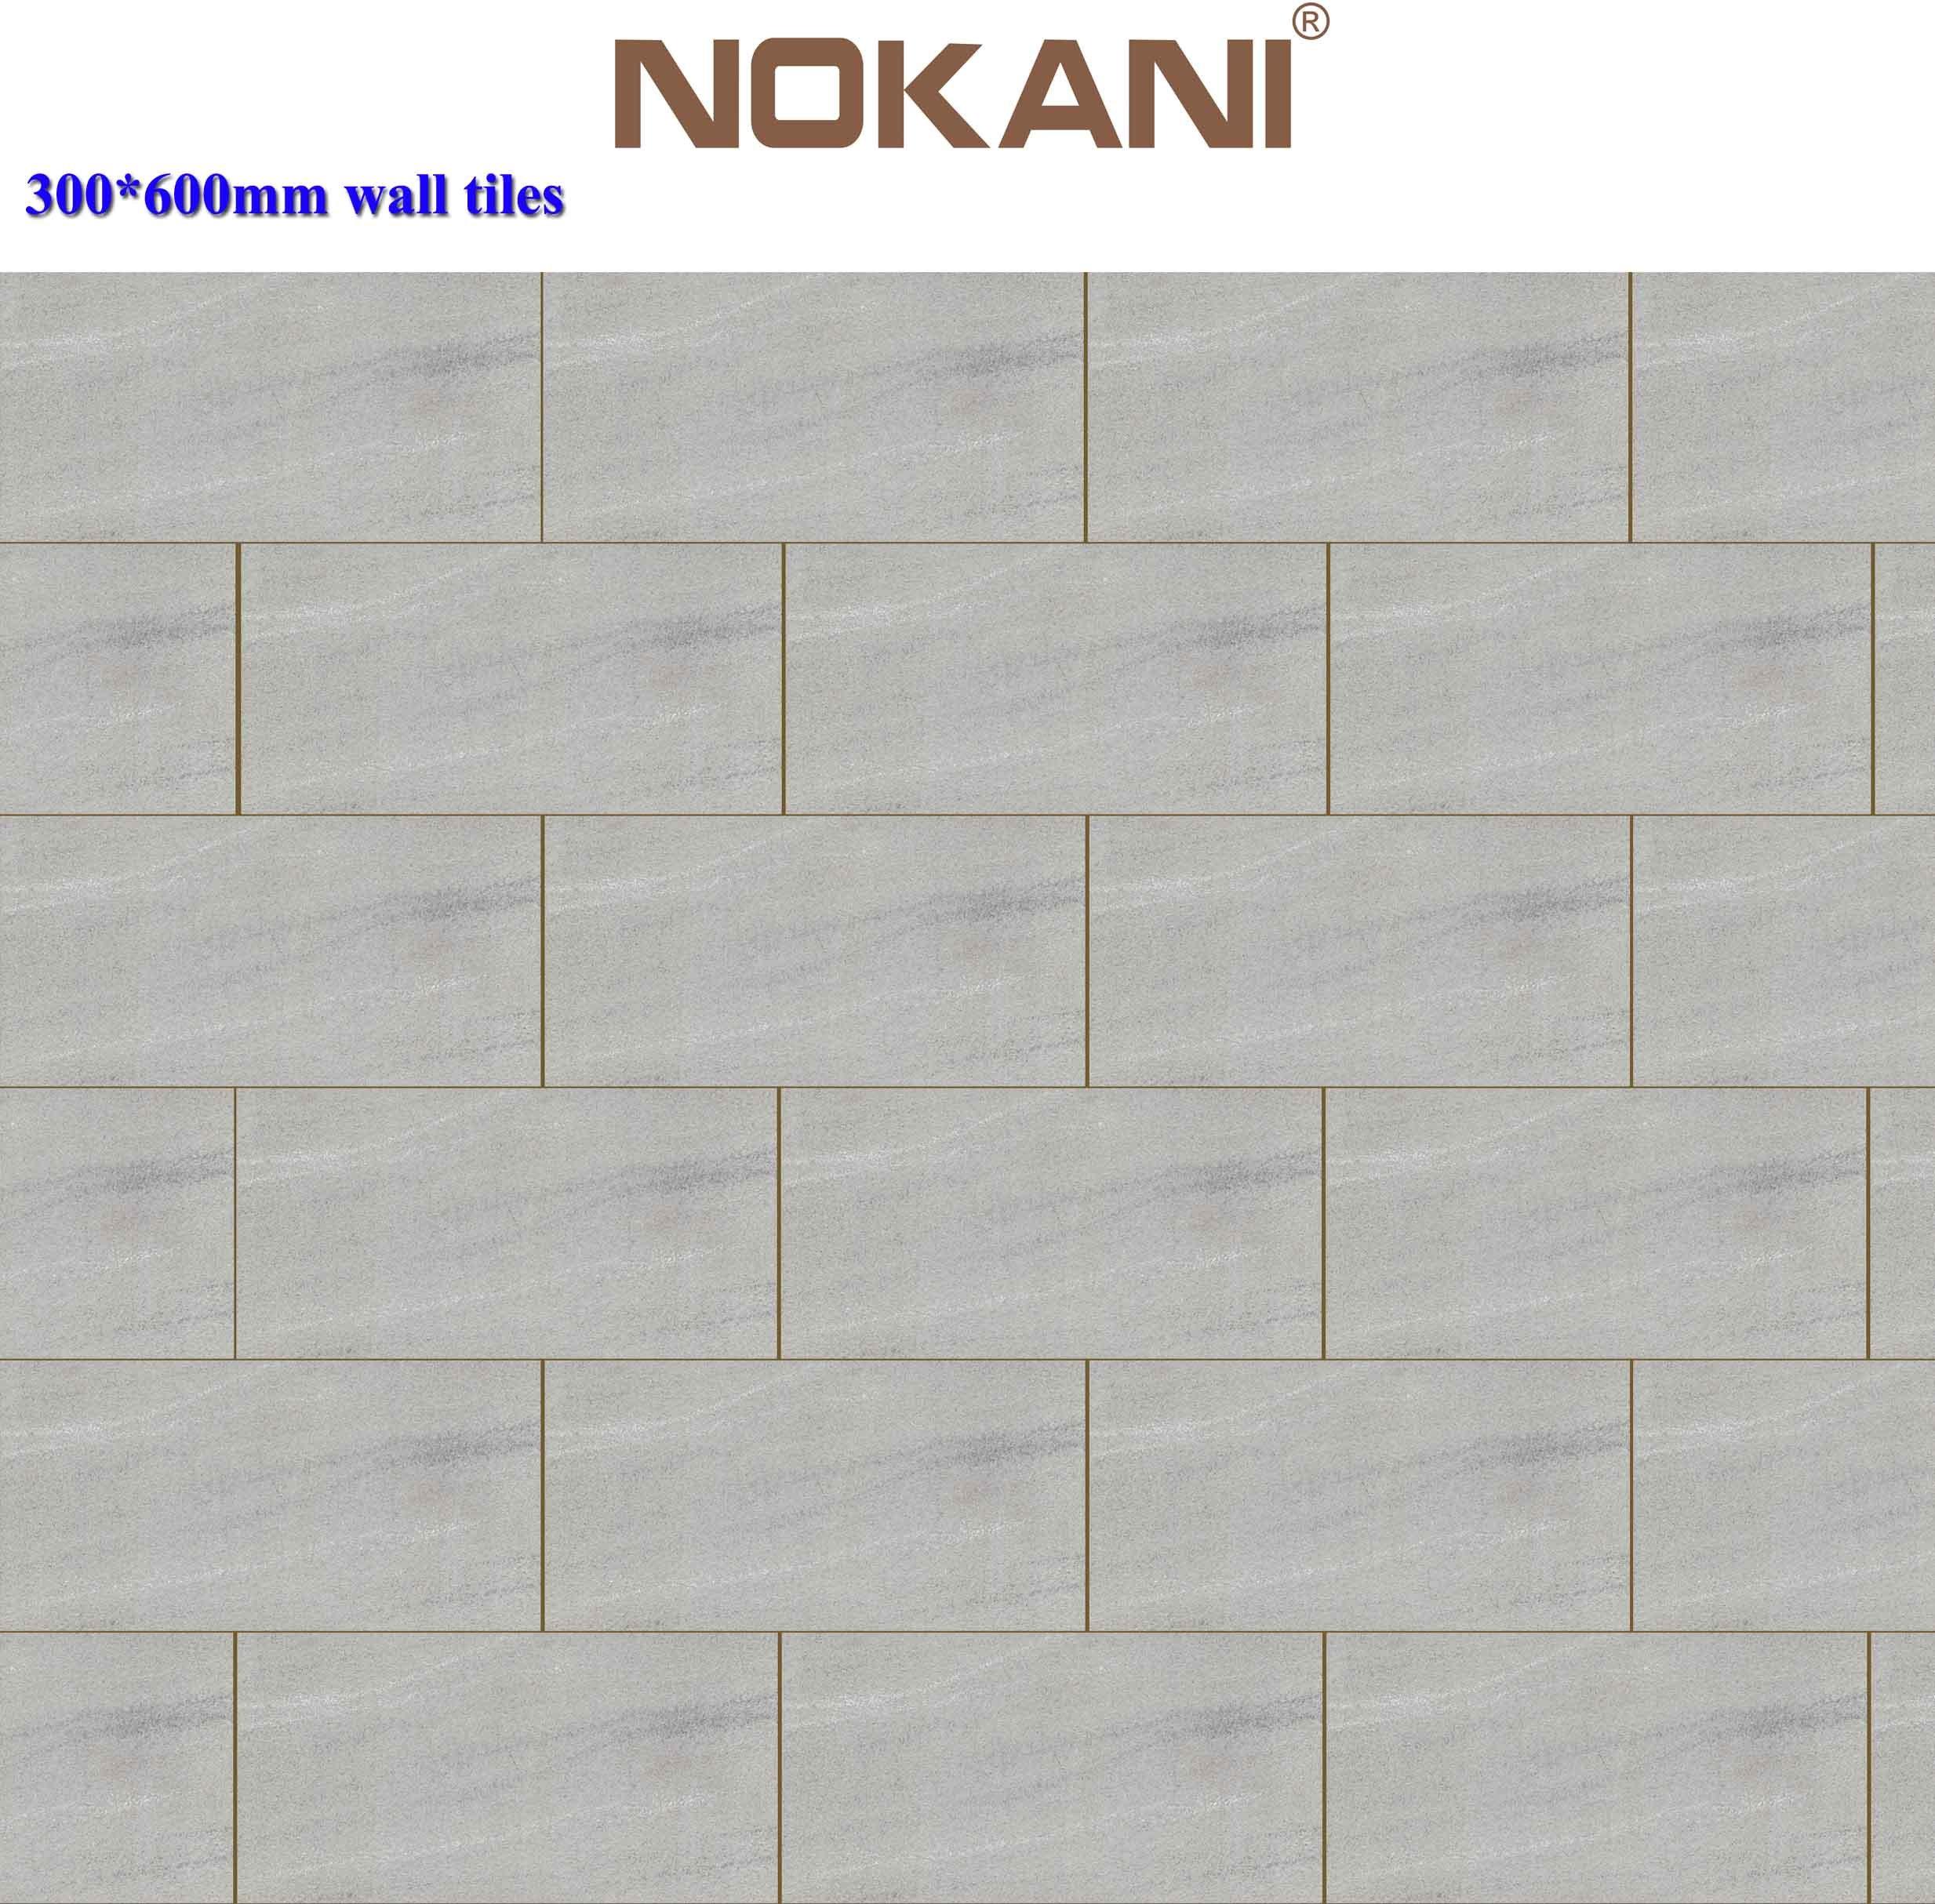 Grey Colour Facing Brick Tiles Ceramic Tile for Wall Tile Decoration